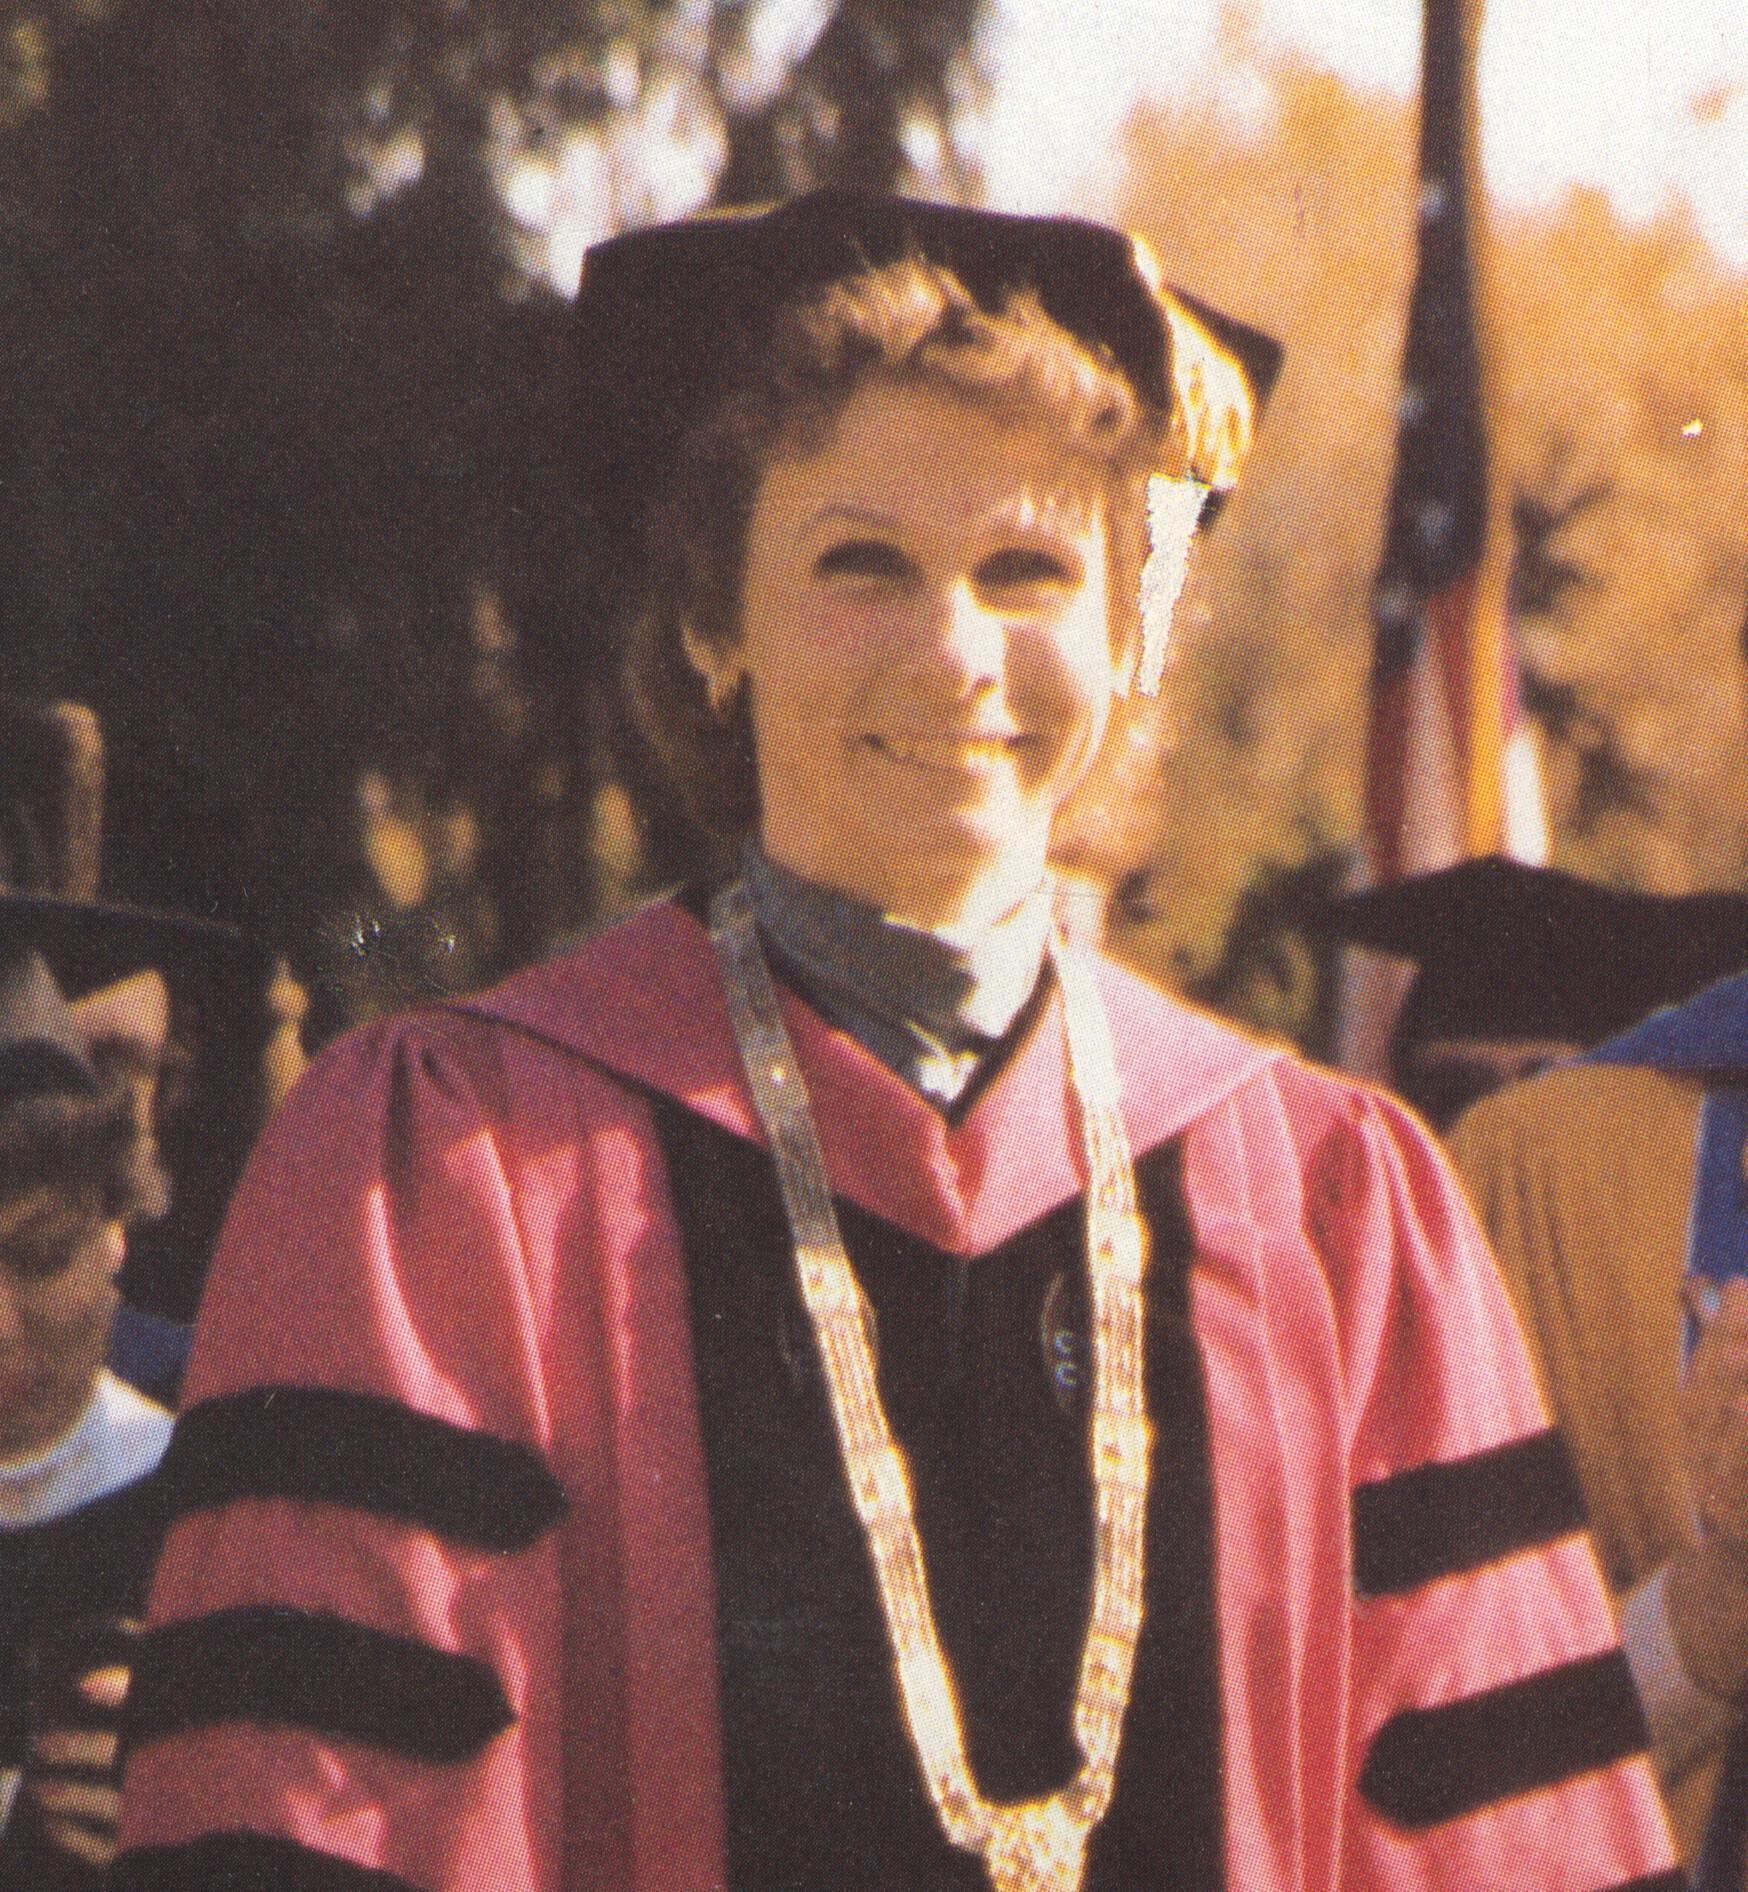 Frances D. Fergusson, Vassar's ninth president, served the college for 20 years.